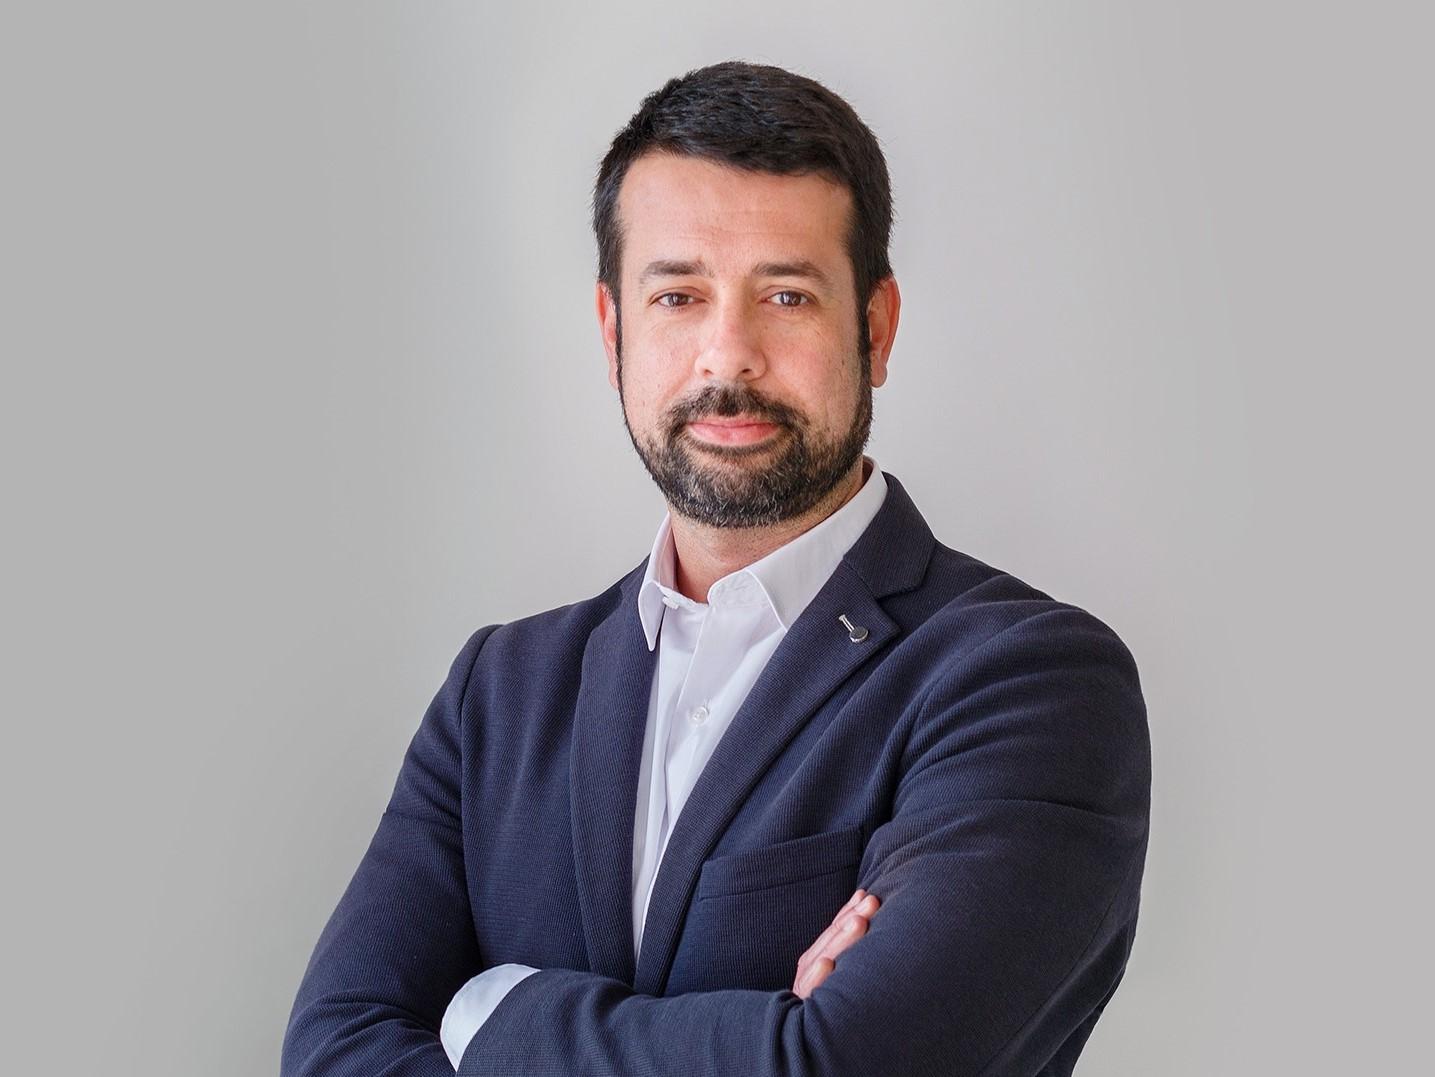 Pablo Ródenas